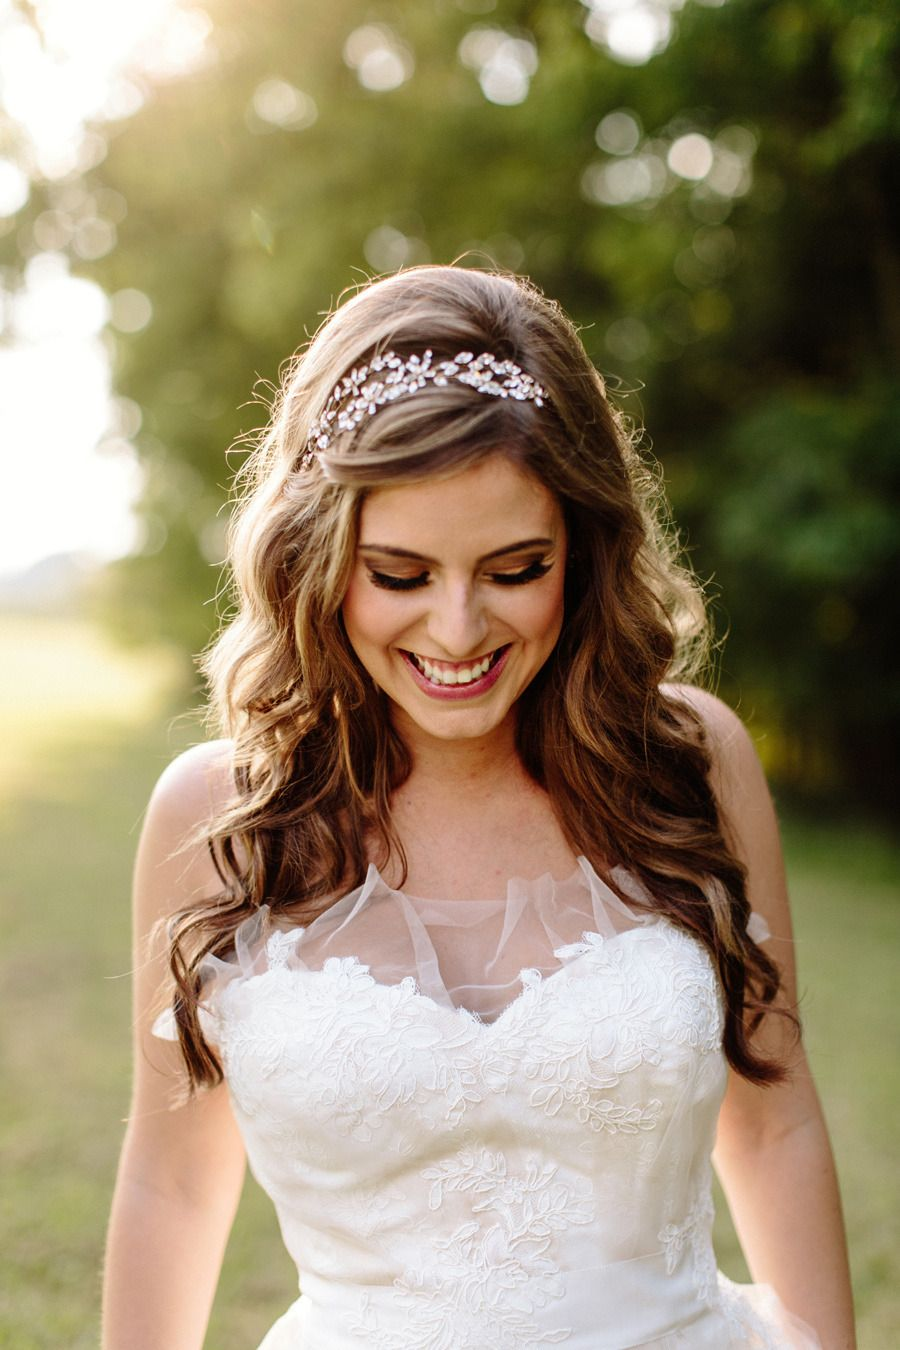 oaks at salem wedding | hair in 2019 | summer wedding